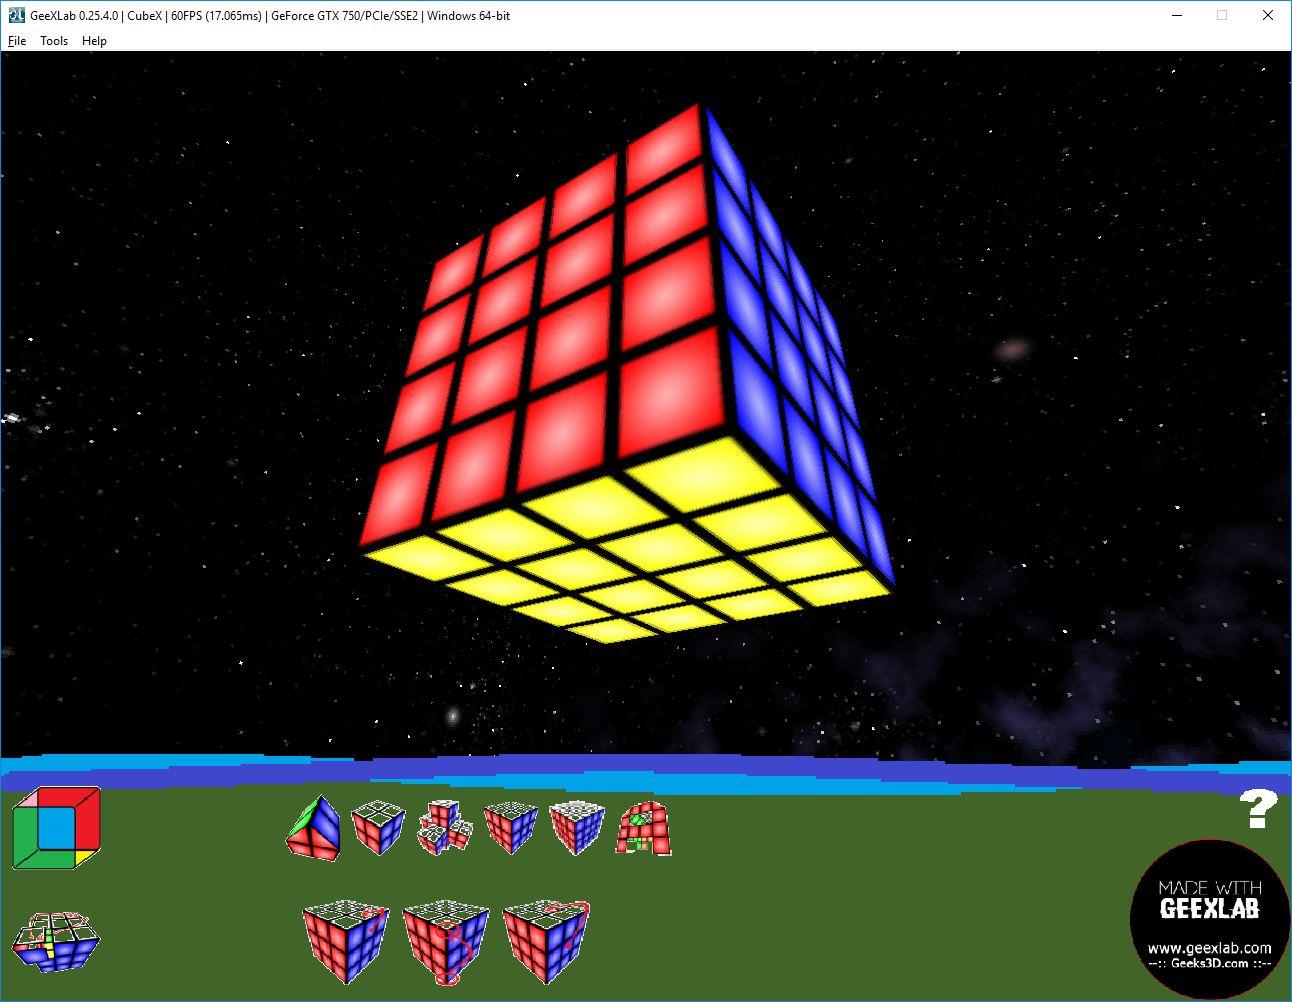 Cubex multiformes 4x4